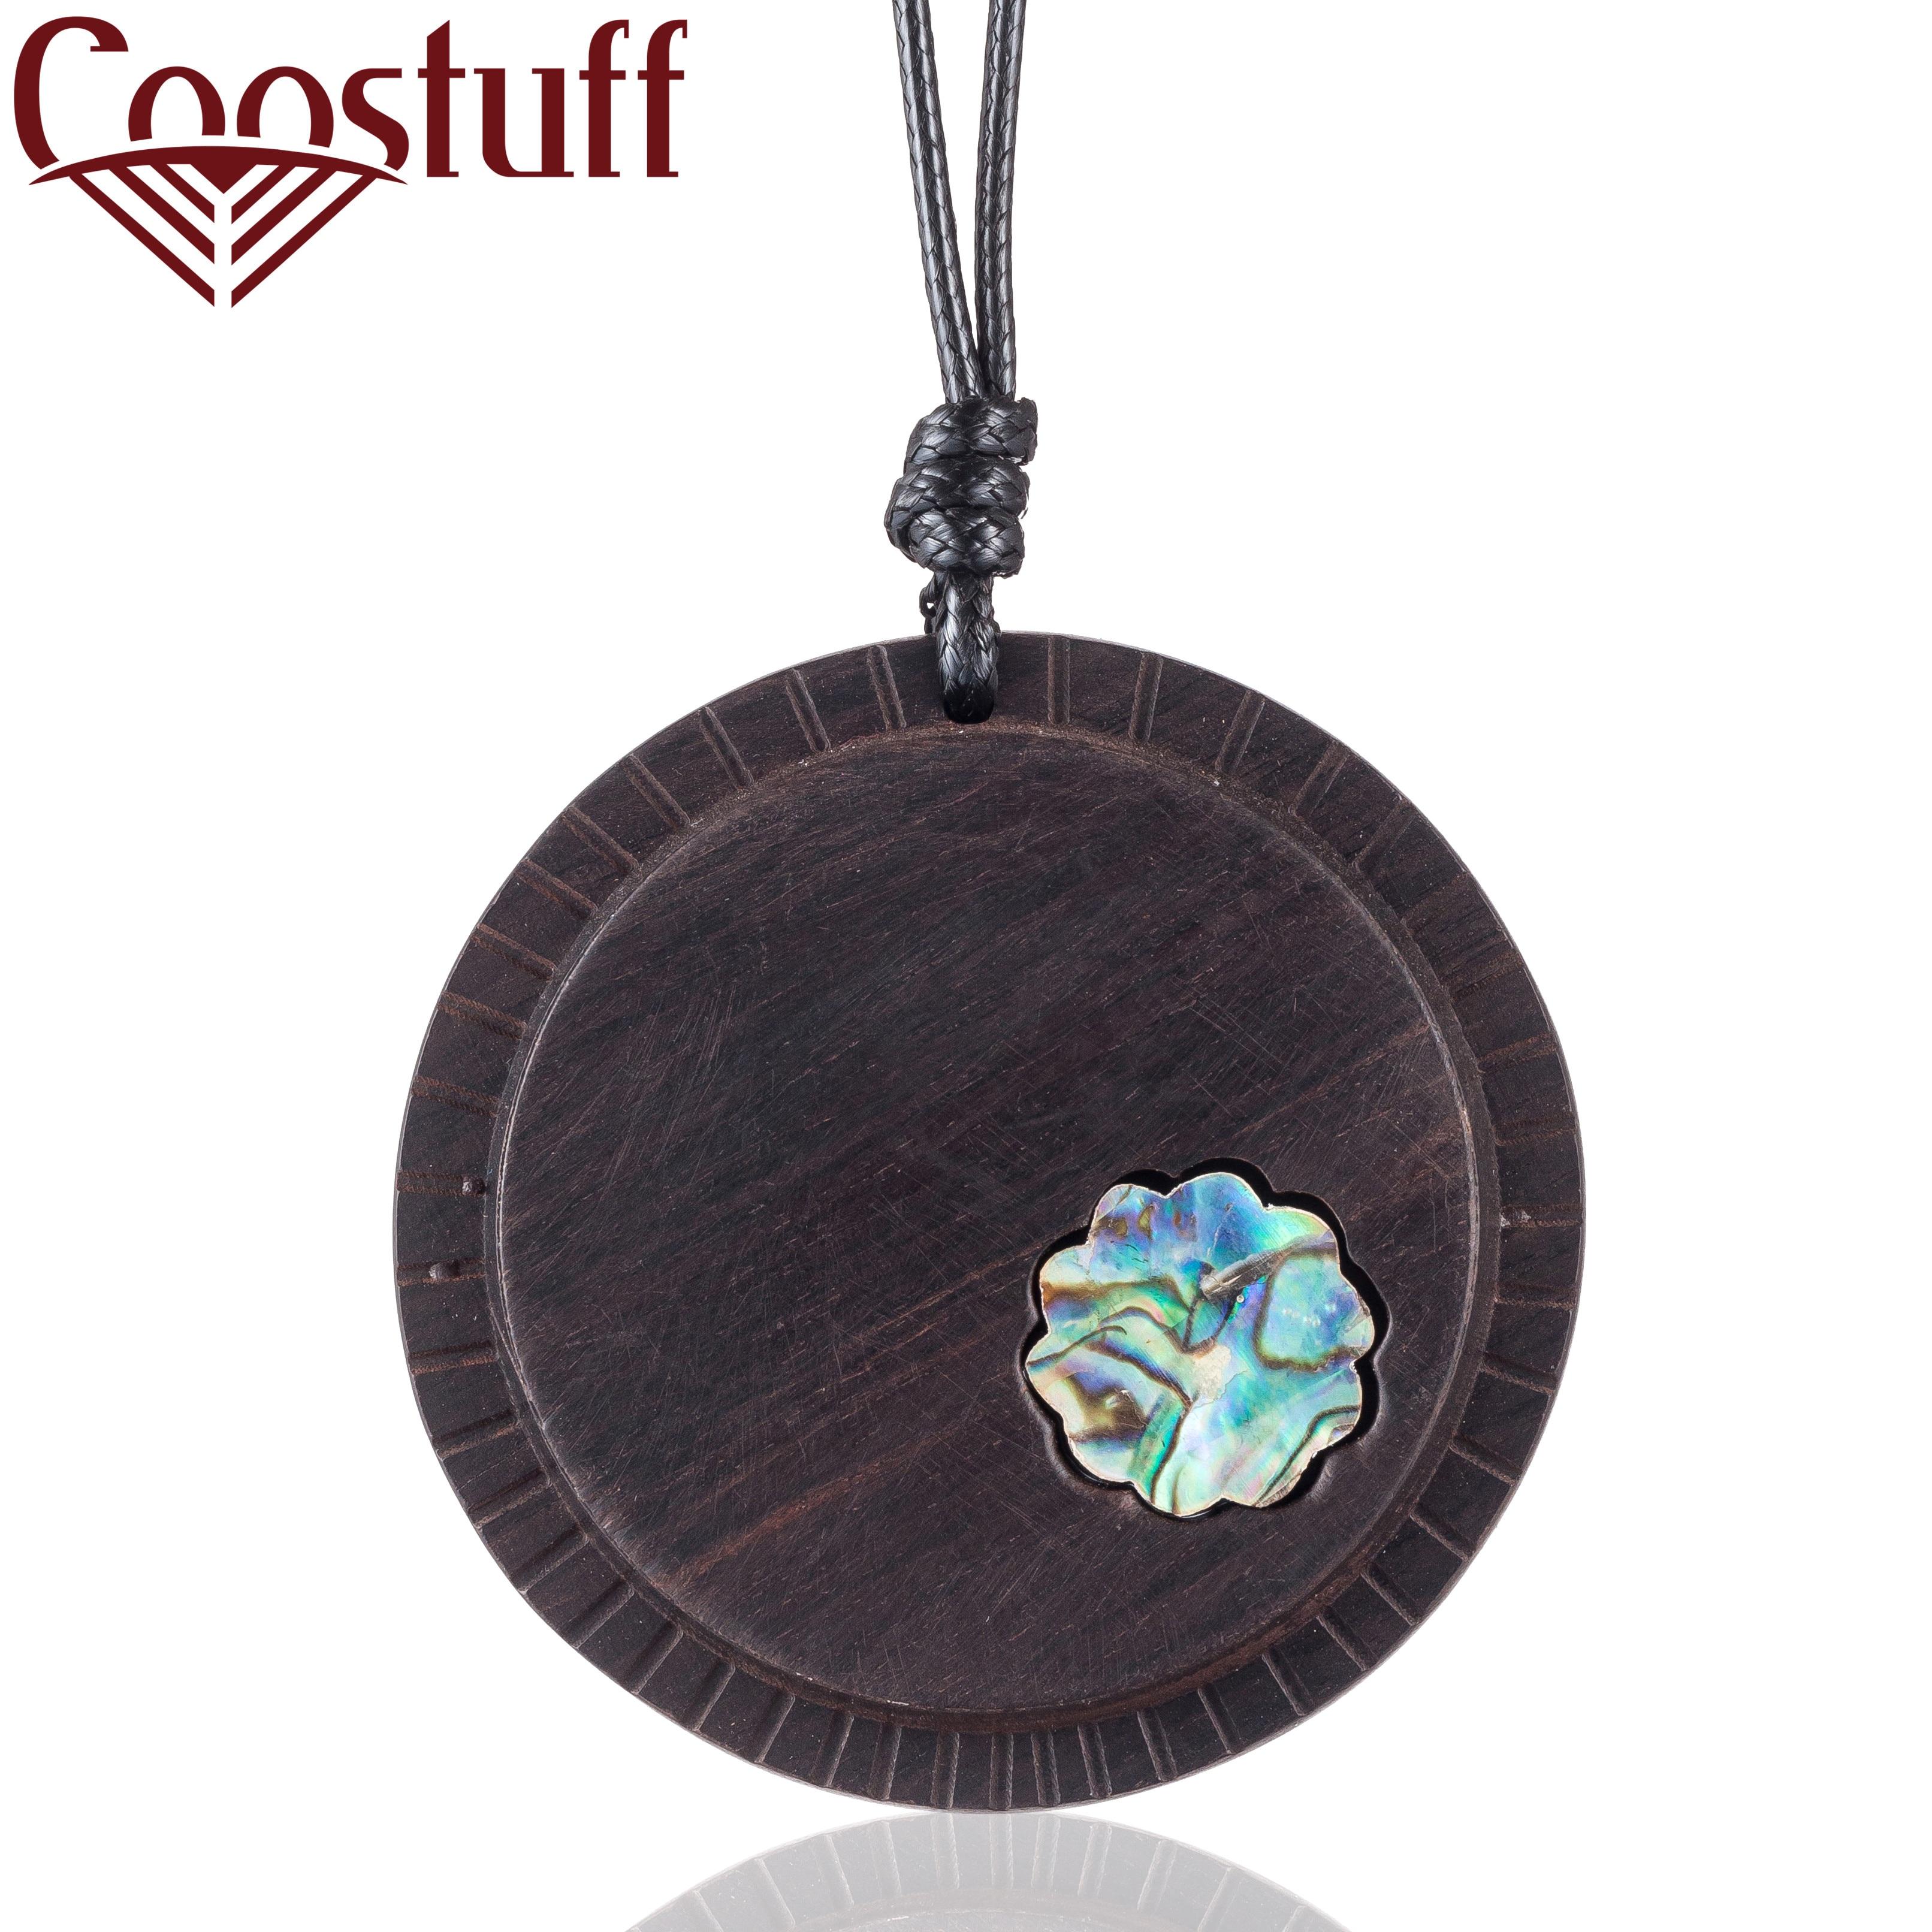 Big Pendant Sandalwood Necklaces Women Vintage Jewelry necklaces pendants women collares mujer choker kolye bijoux